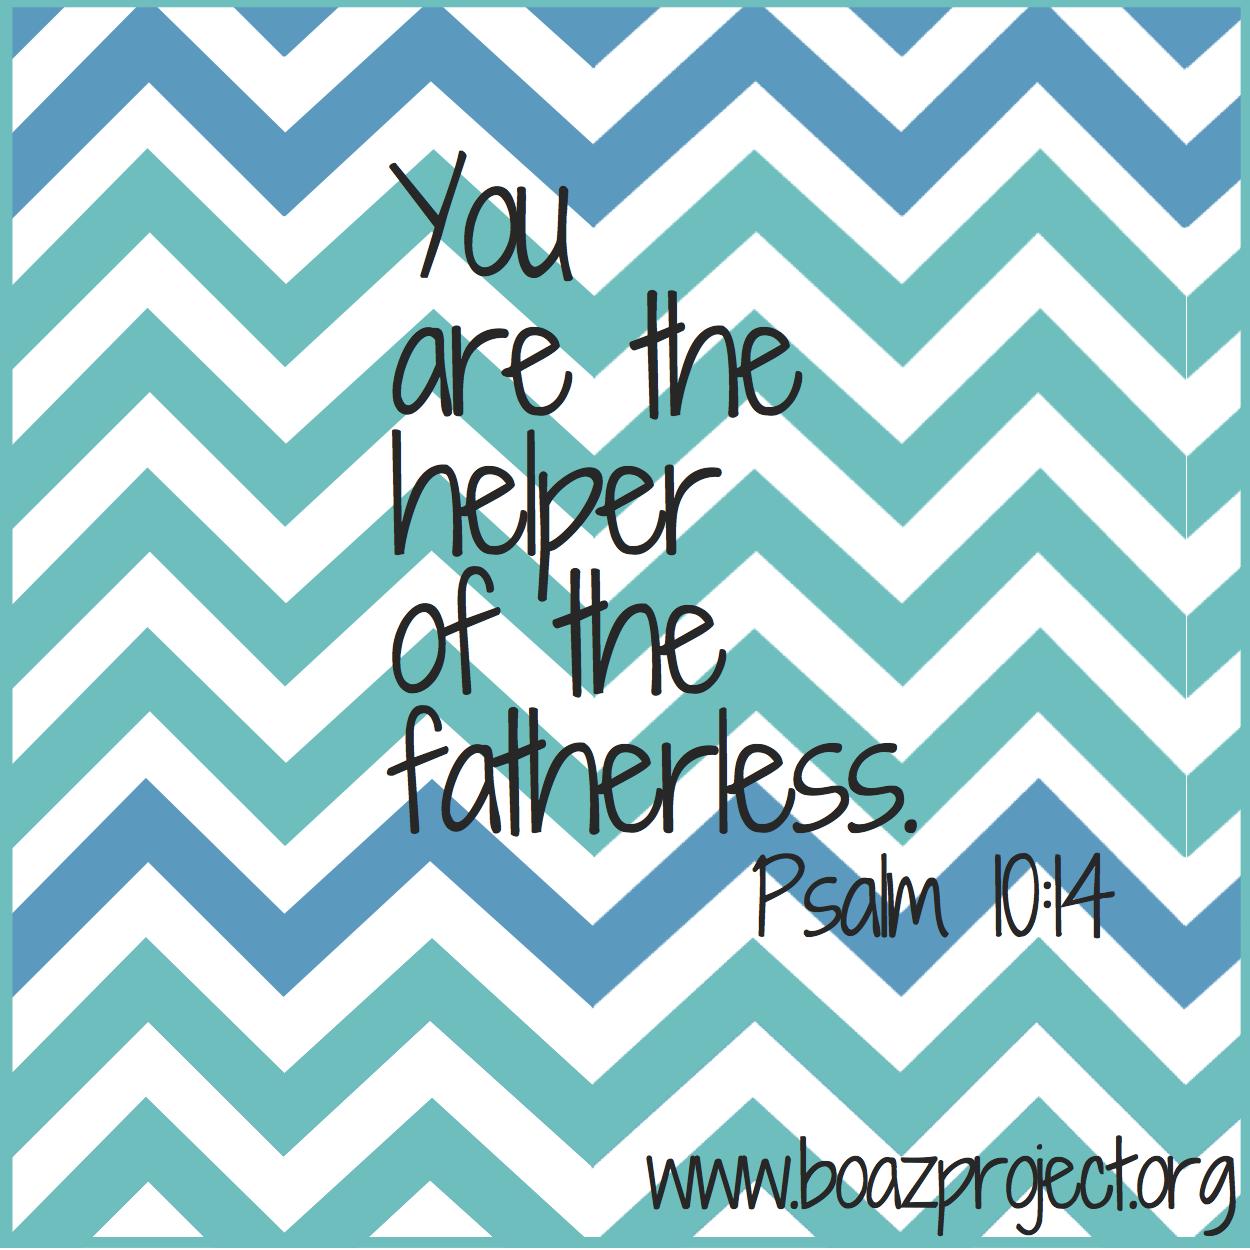 psalm 10_14